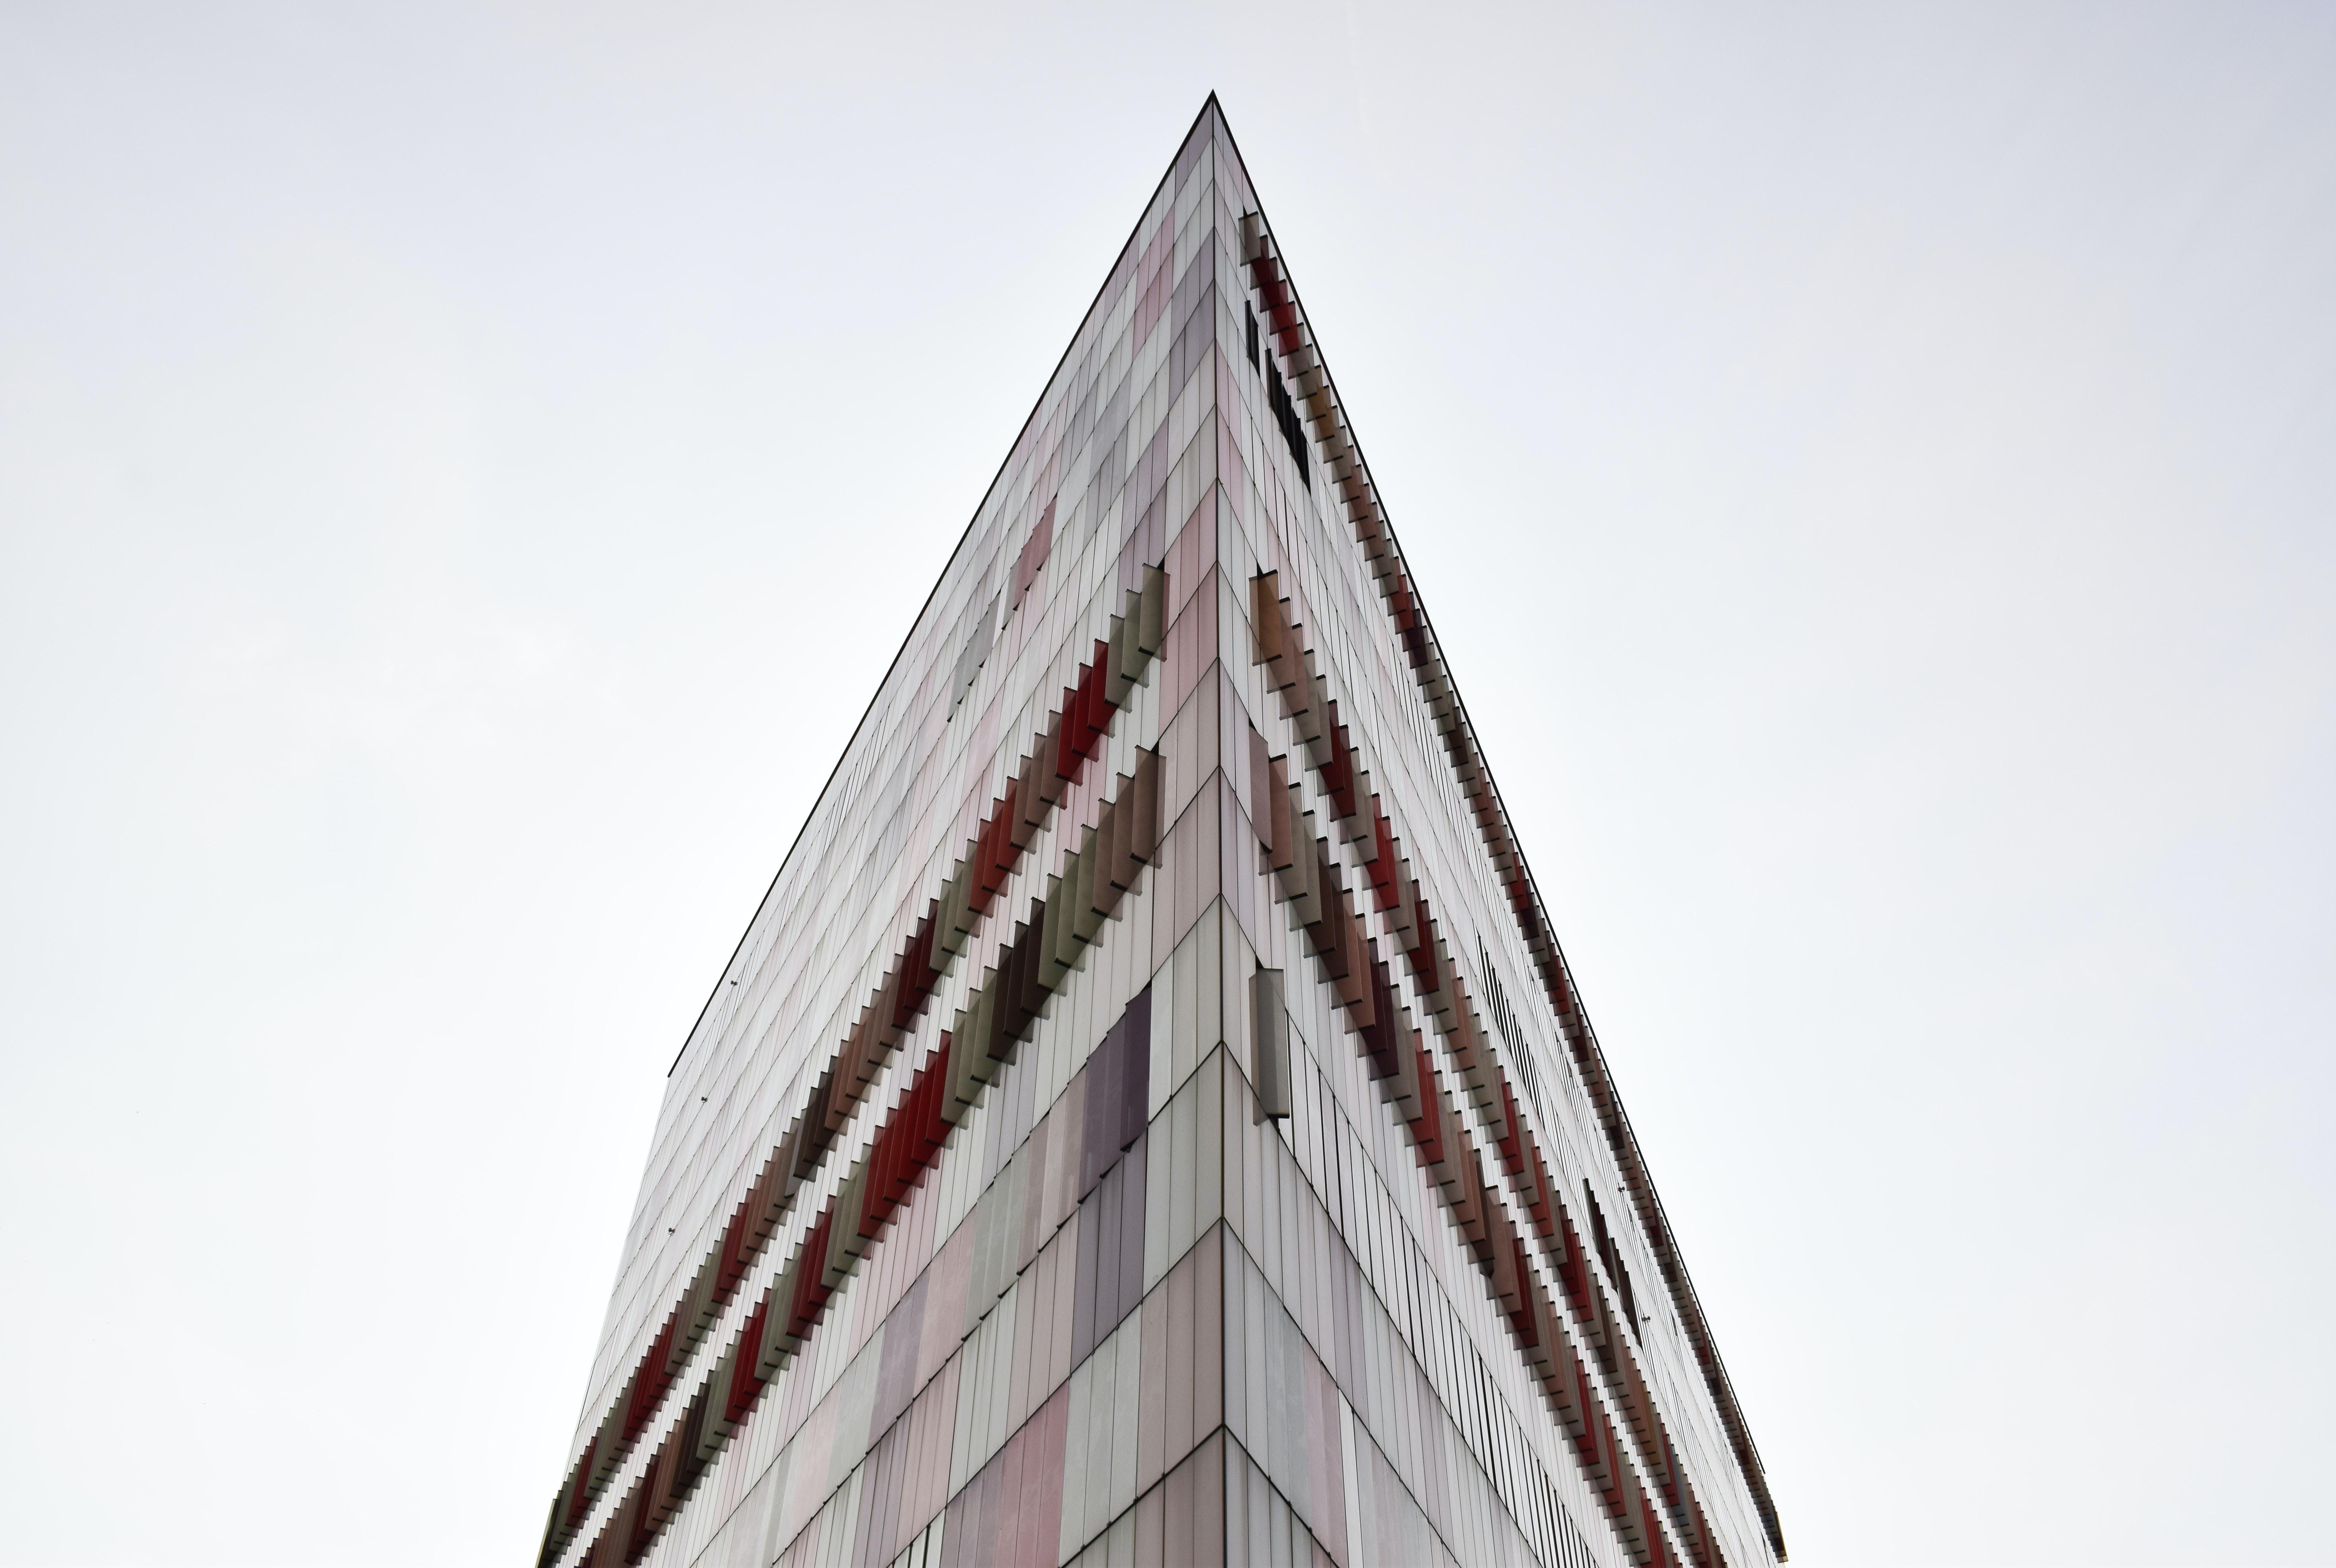 The sharp corner of a tall triangular skyscraper